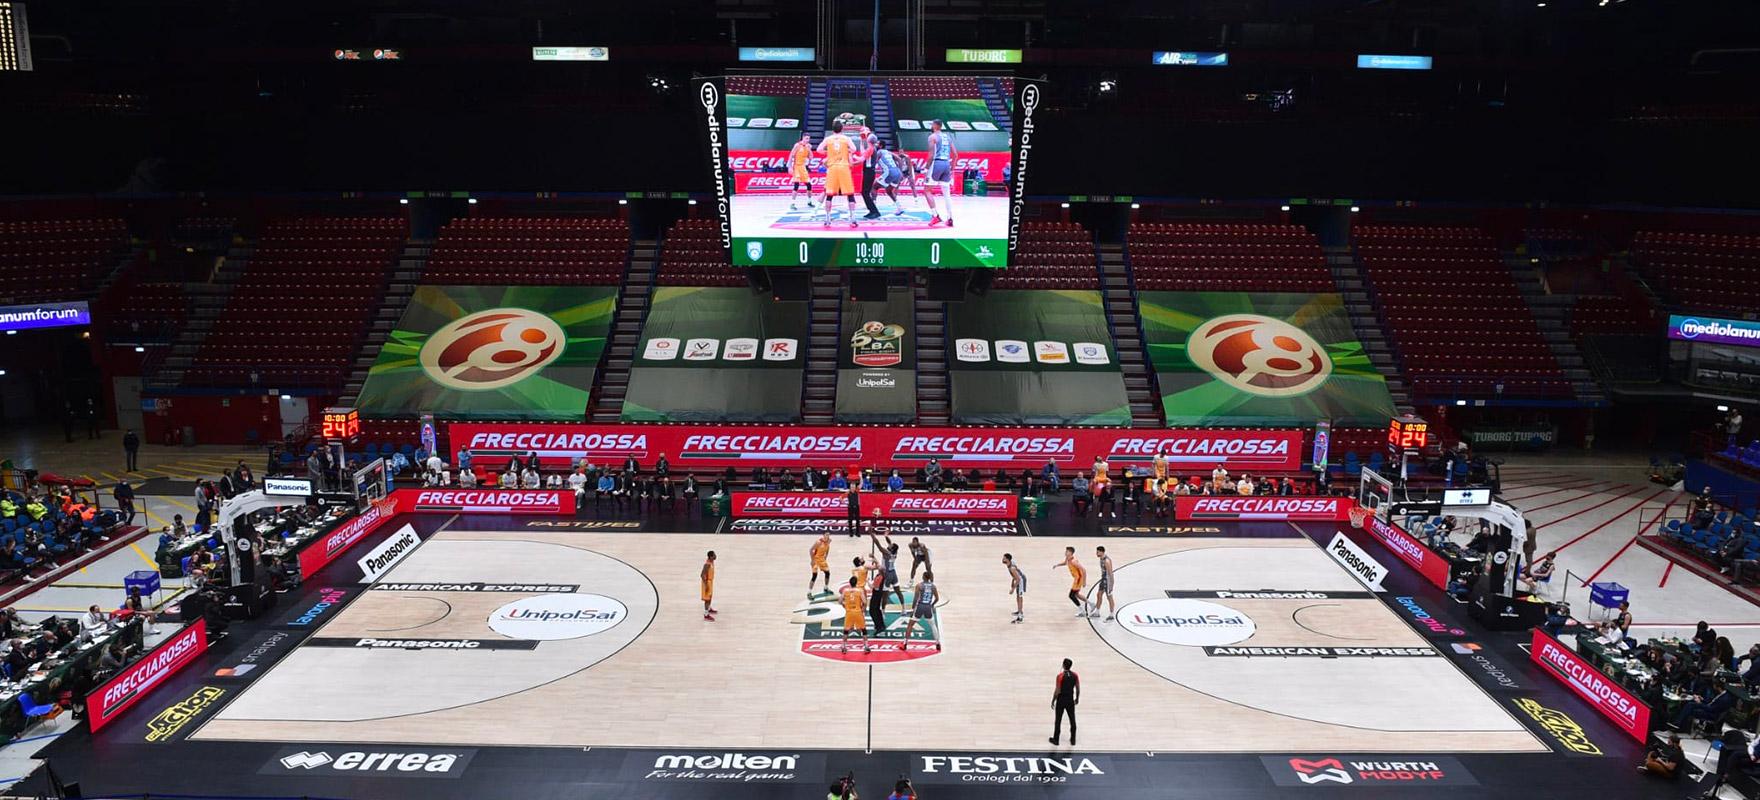 Armani Olimpia banner led bordocampo cubo ledwall segnapunti scoreboard pallacanestro basket Forum Assago